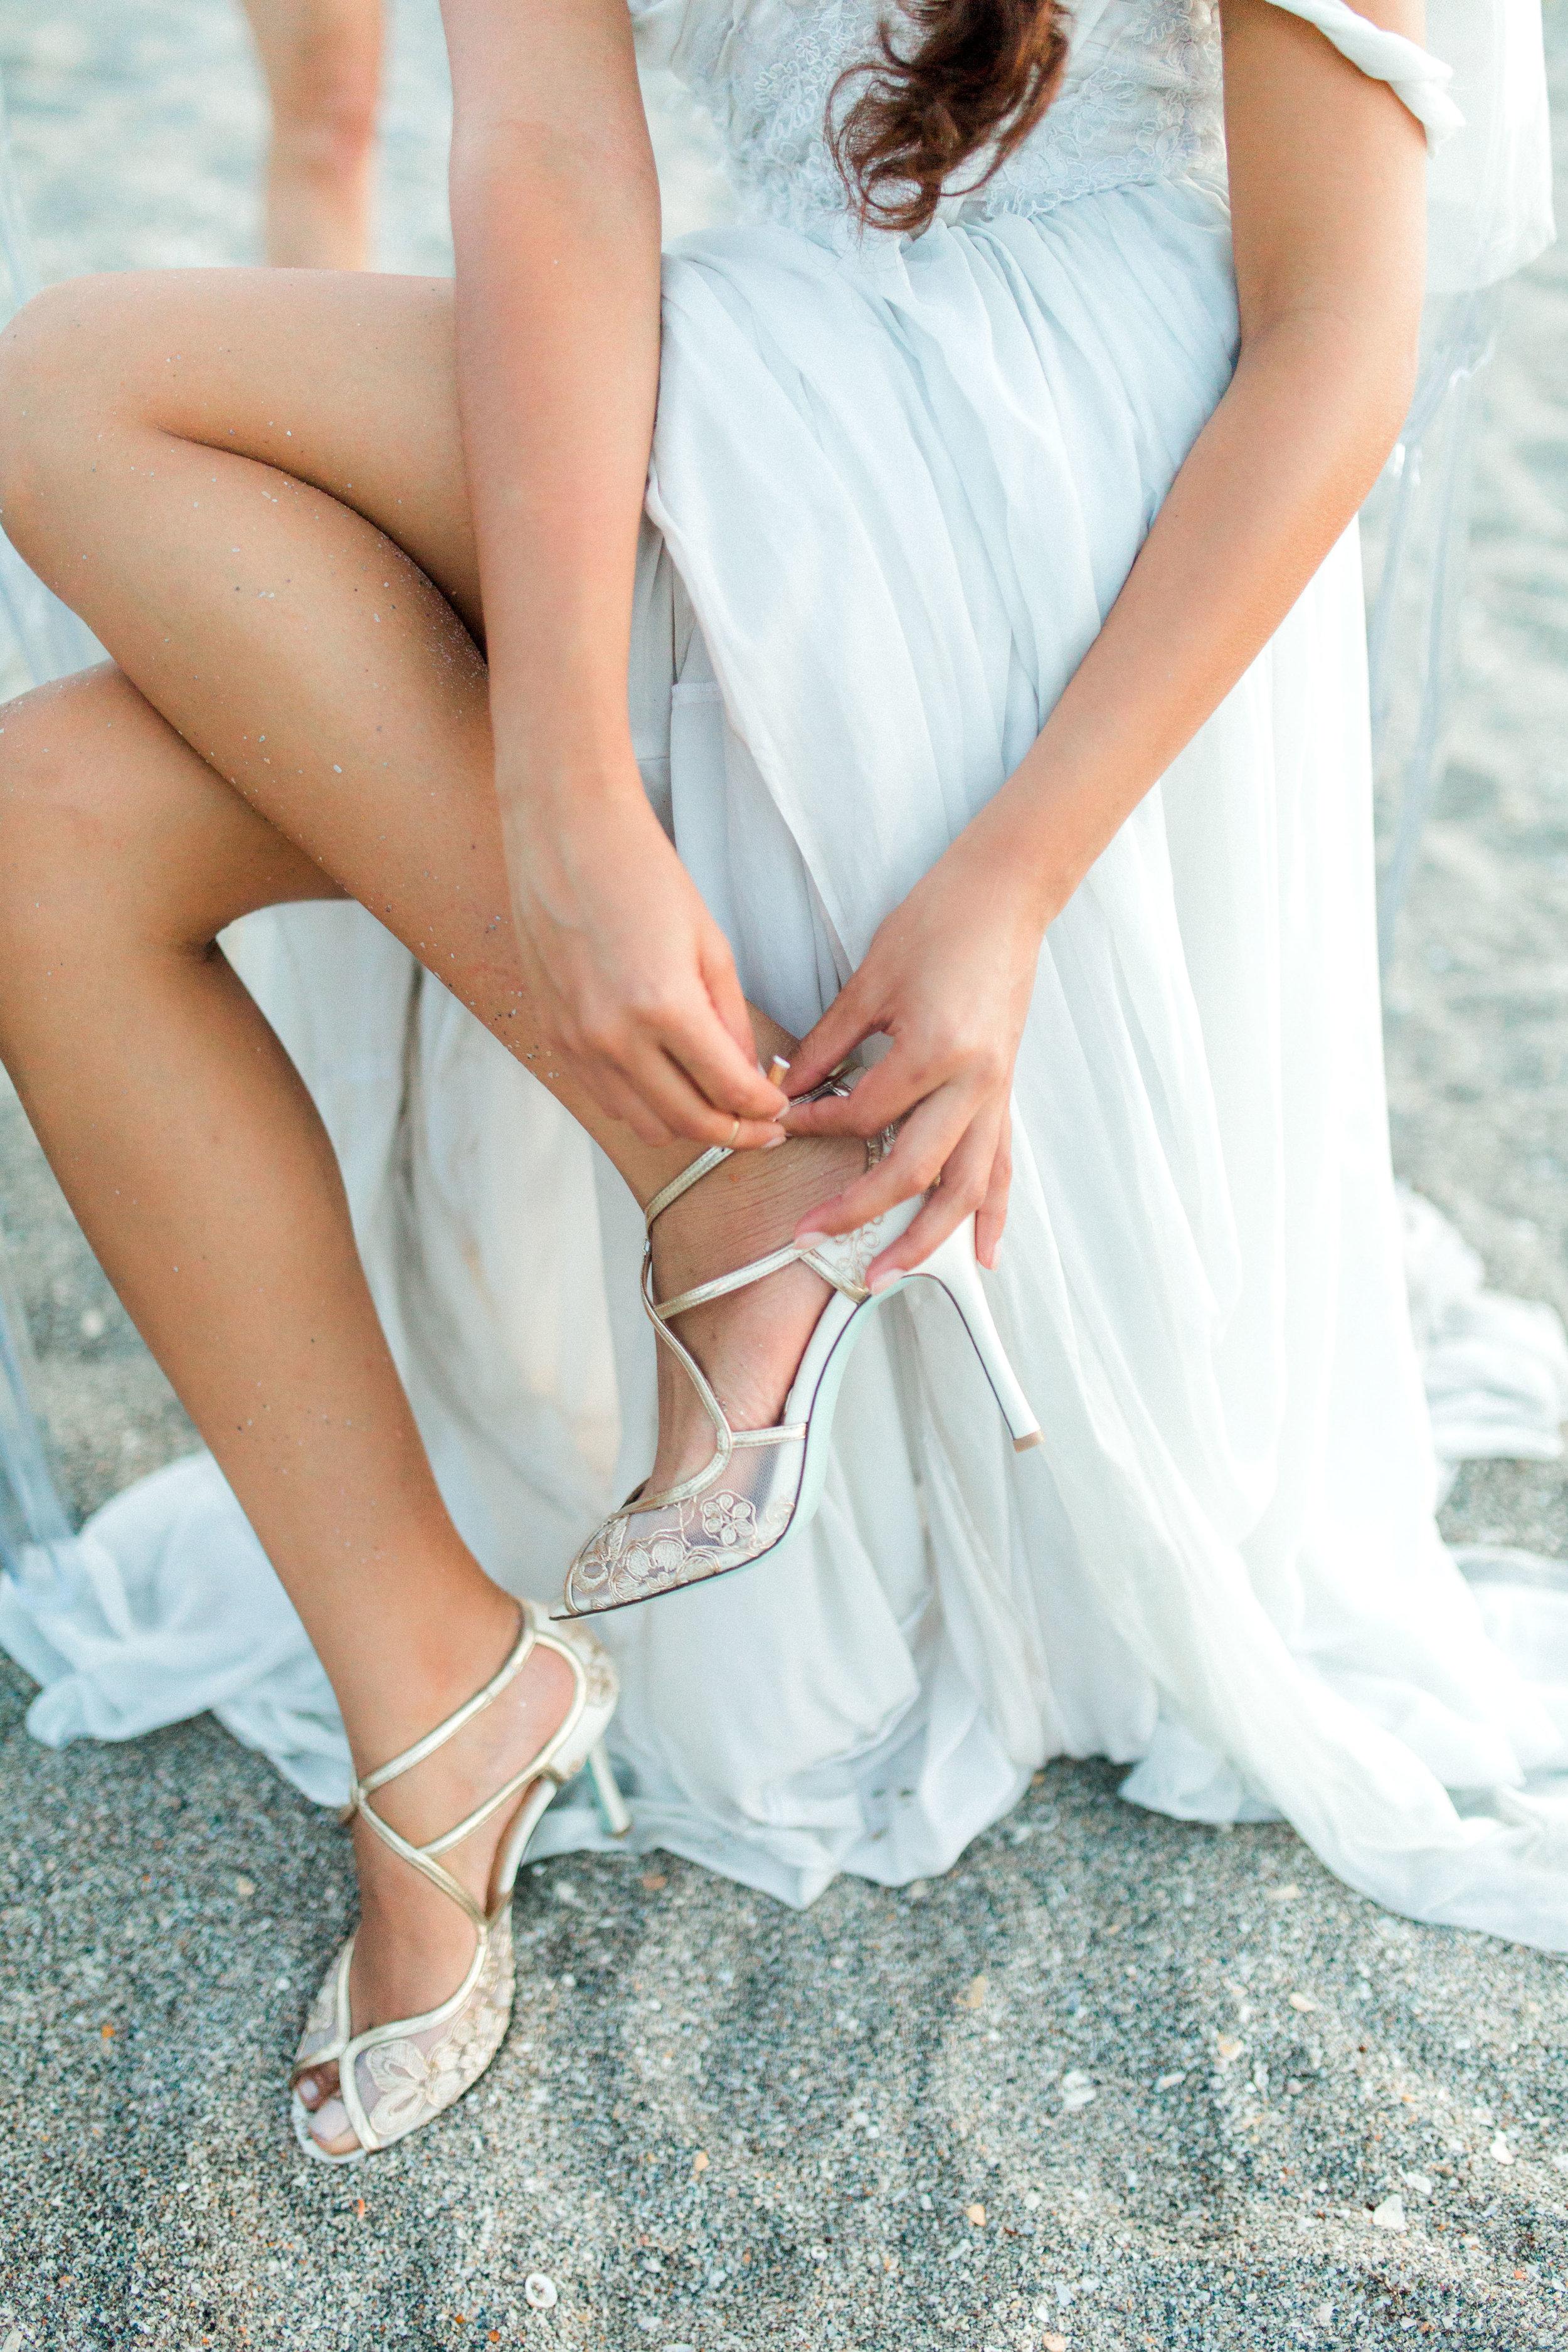 coral cove, jupiter beach FL, palm beach wedding photos, bride putting on shoes